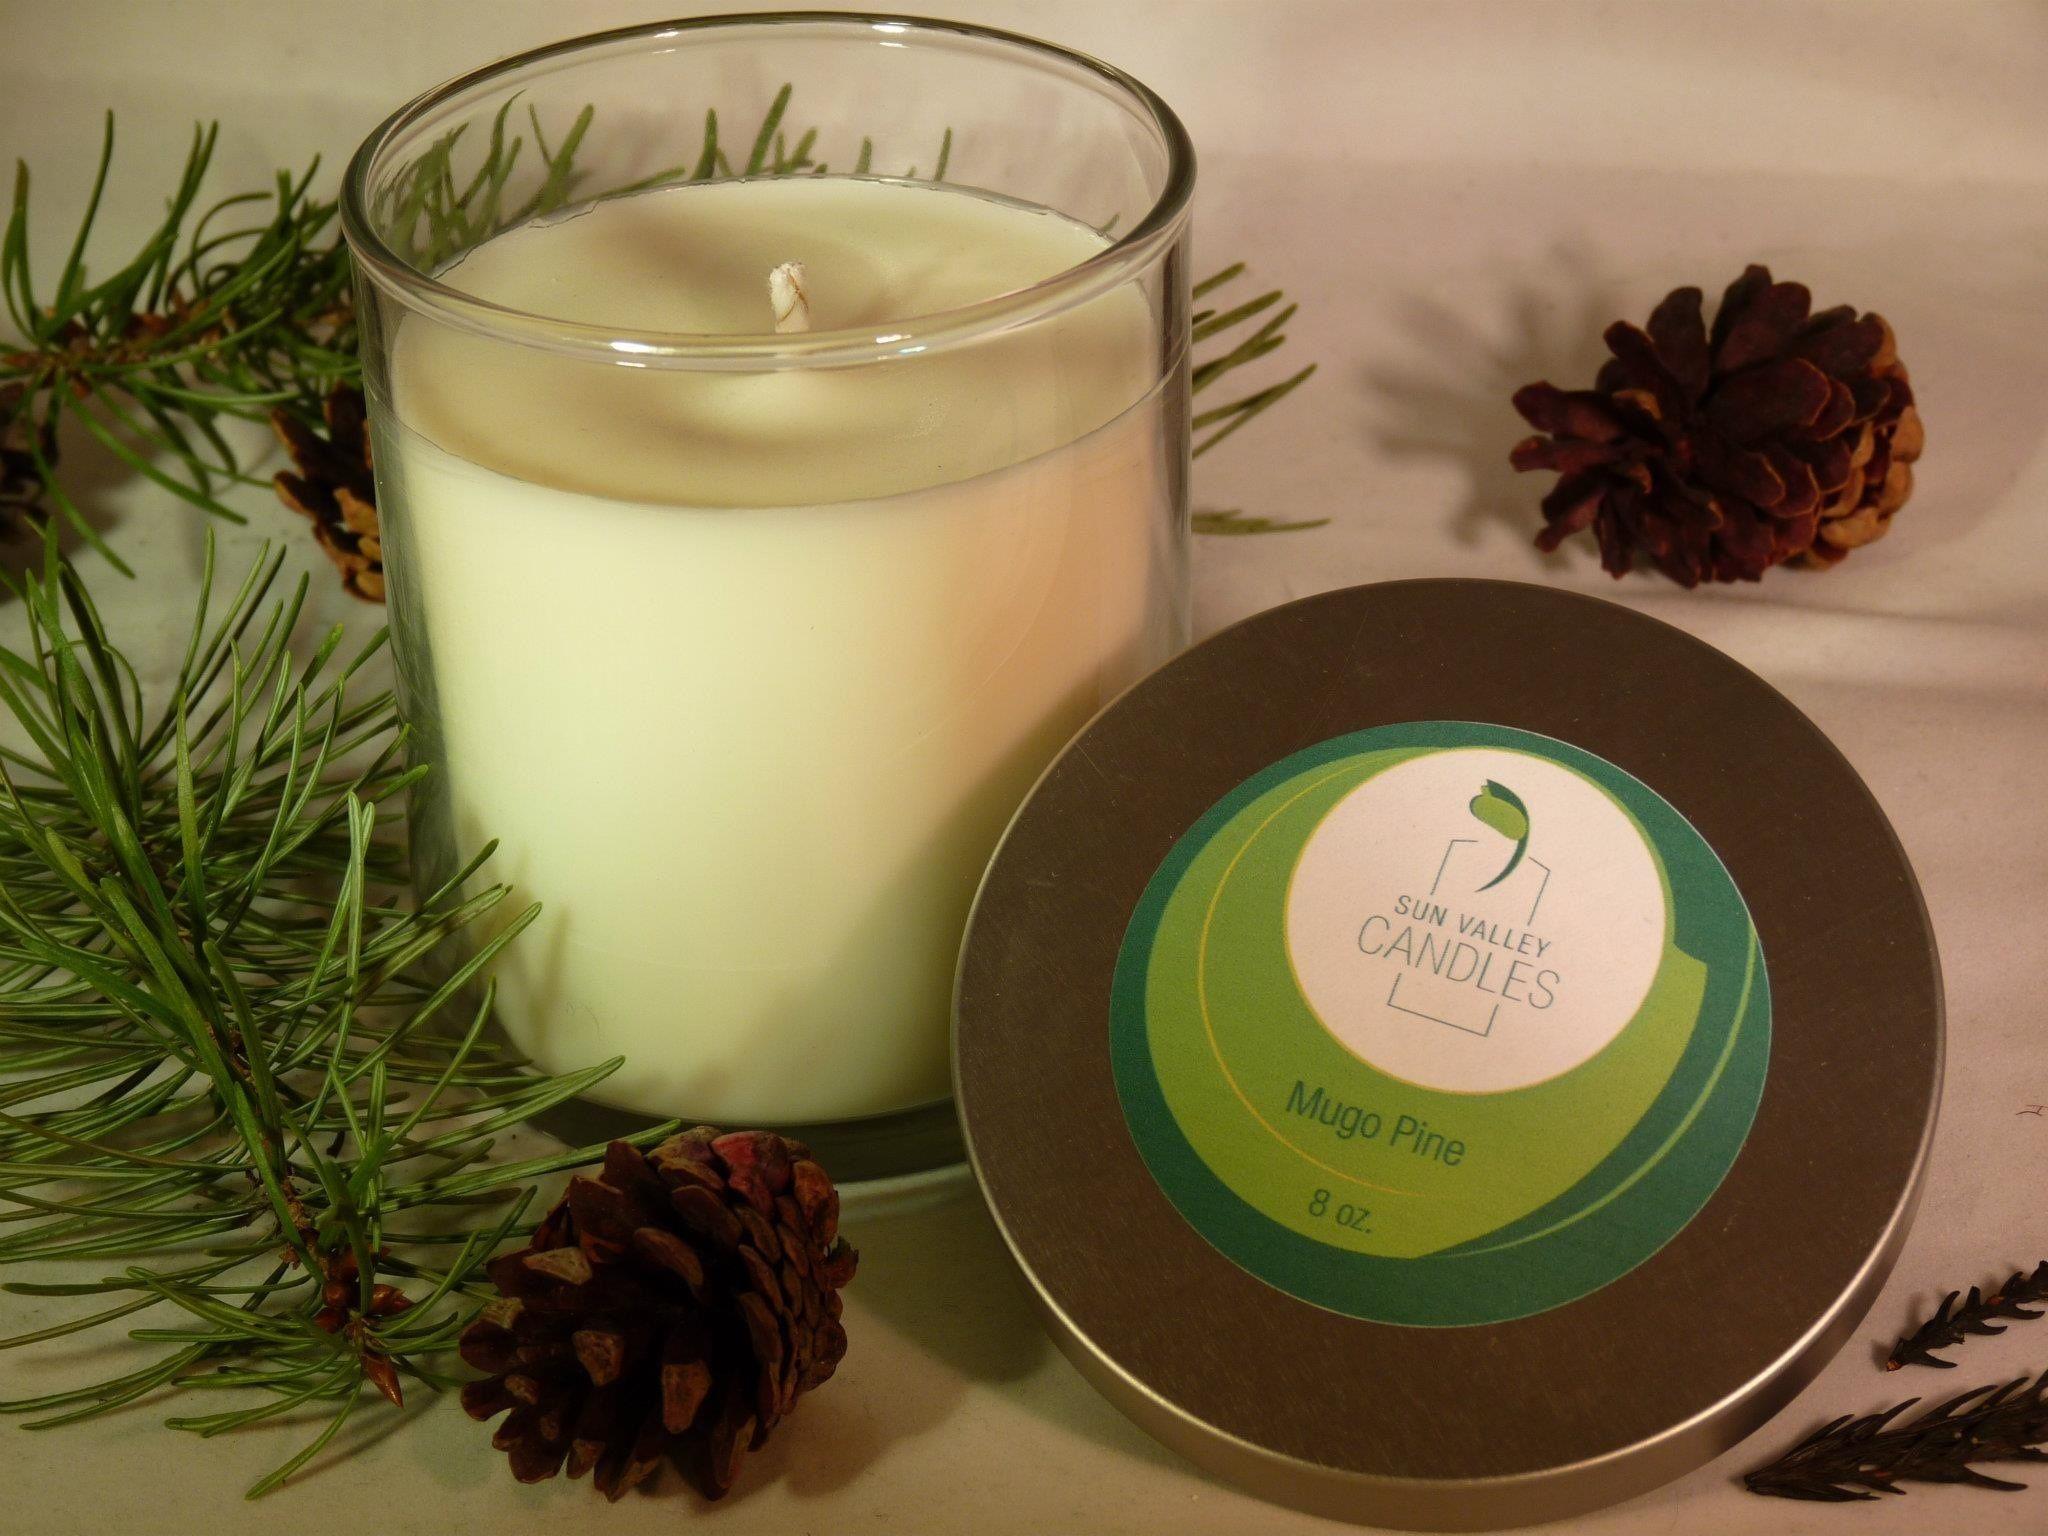 Mugo Pine | Holiday scents, Mugo pine, Orange spice